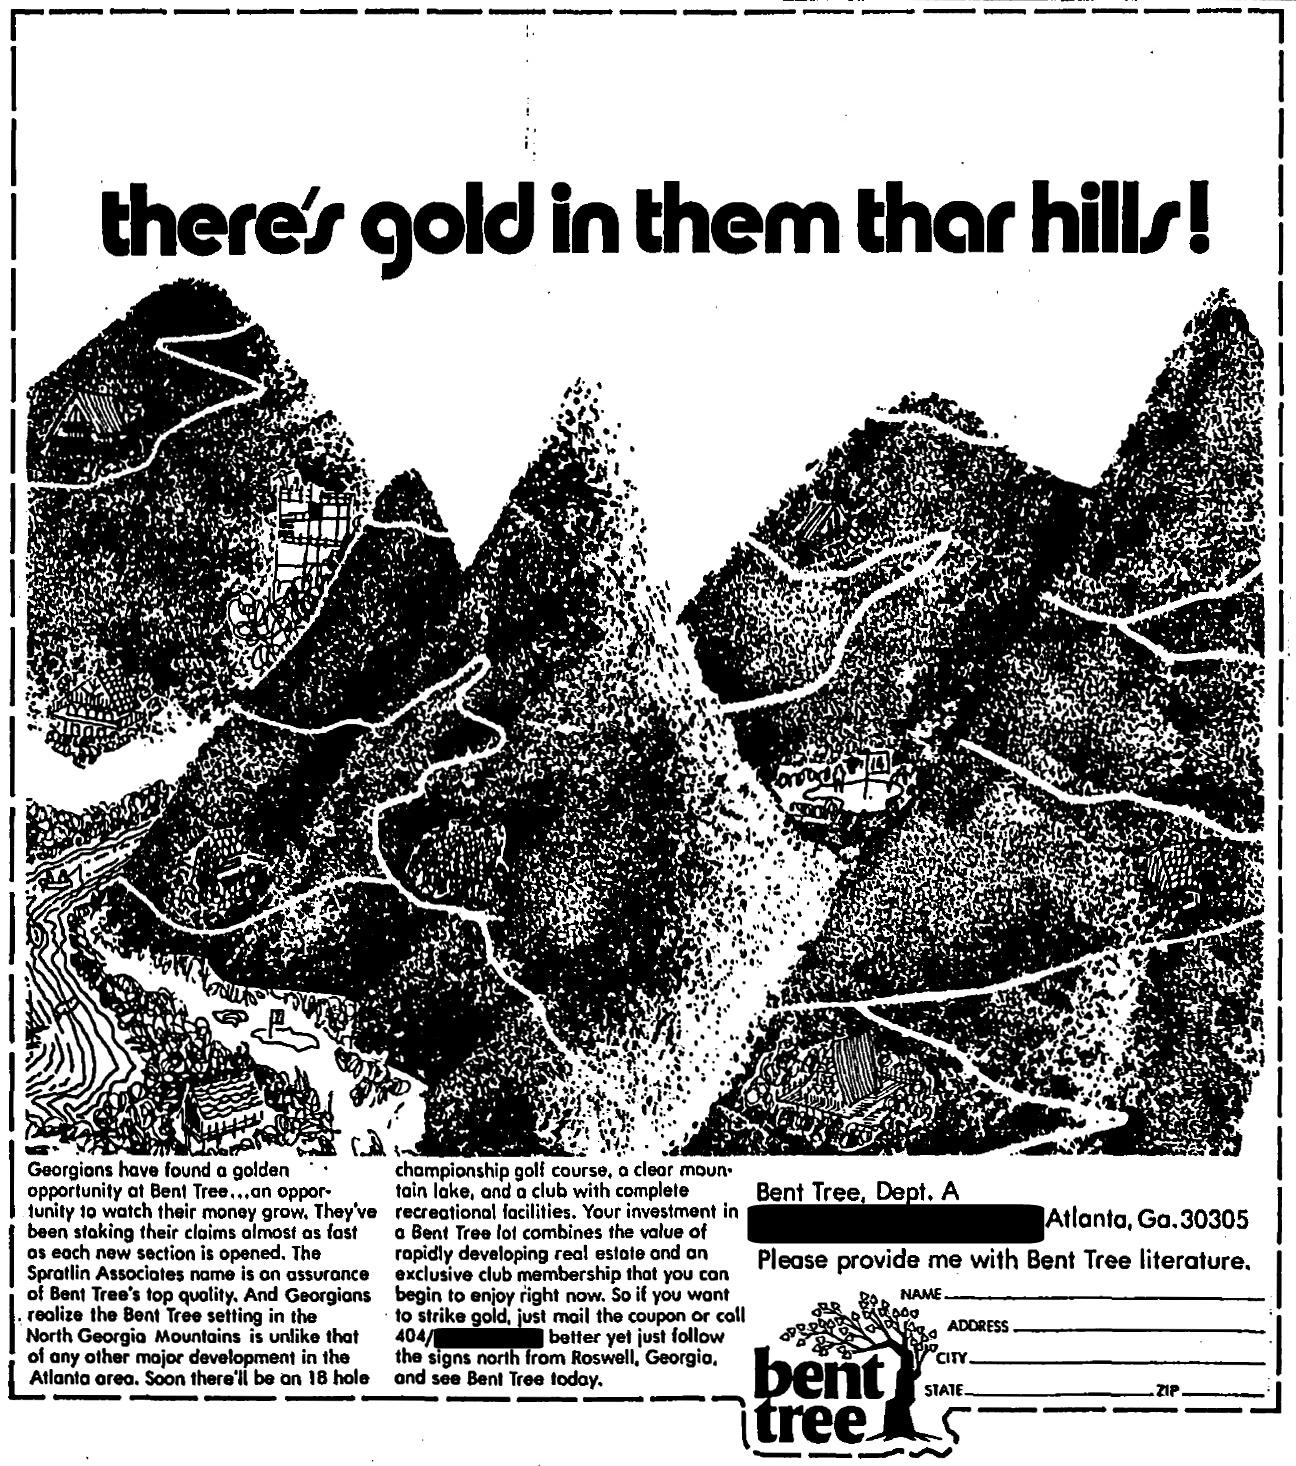 1970 advertisement for Bent Tree